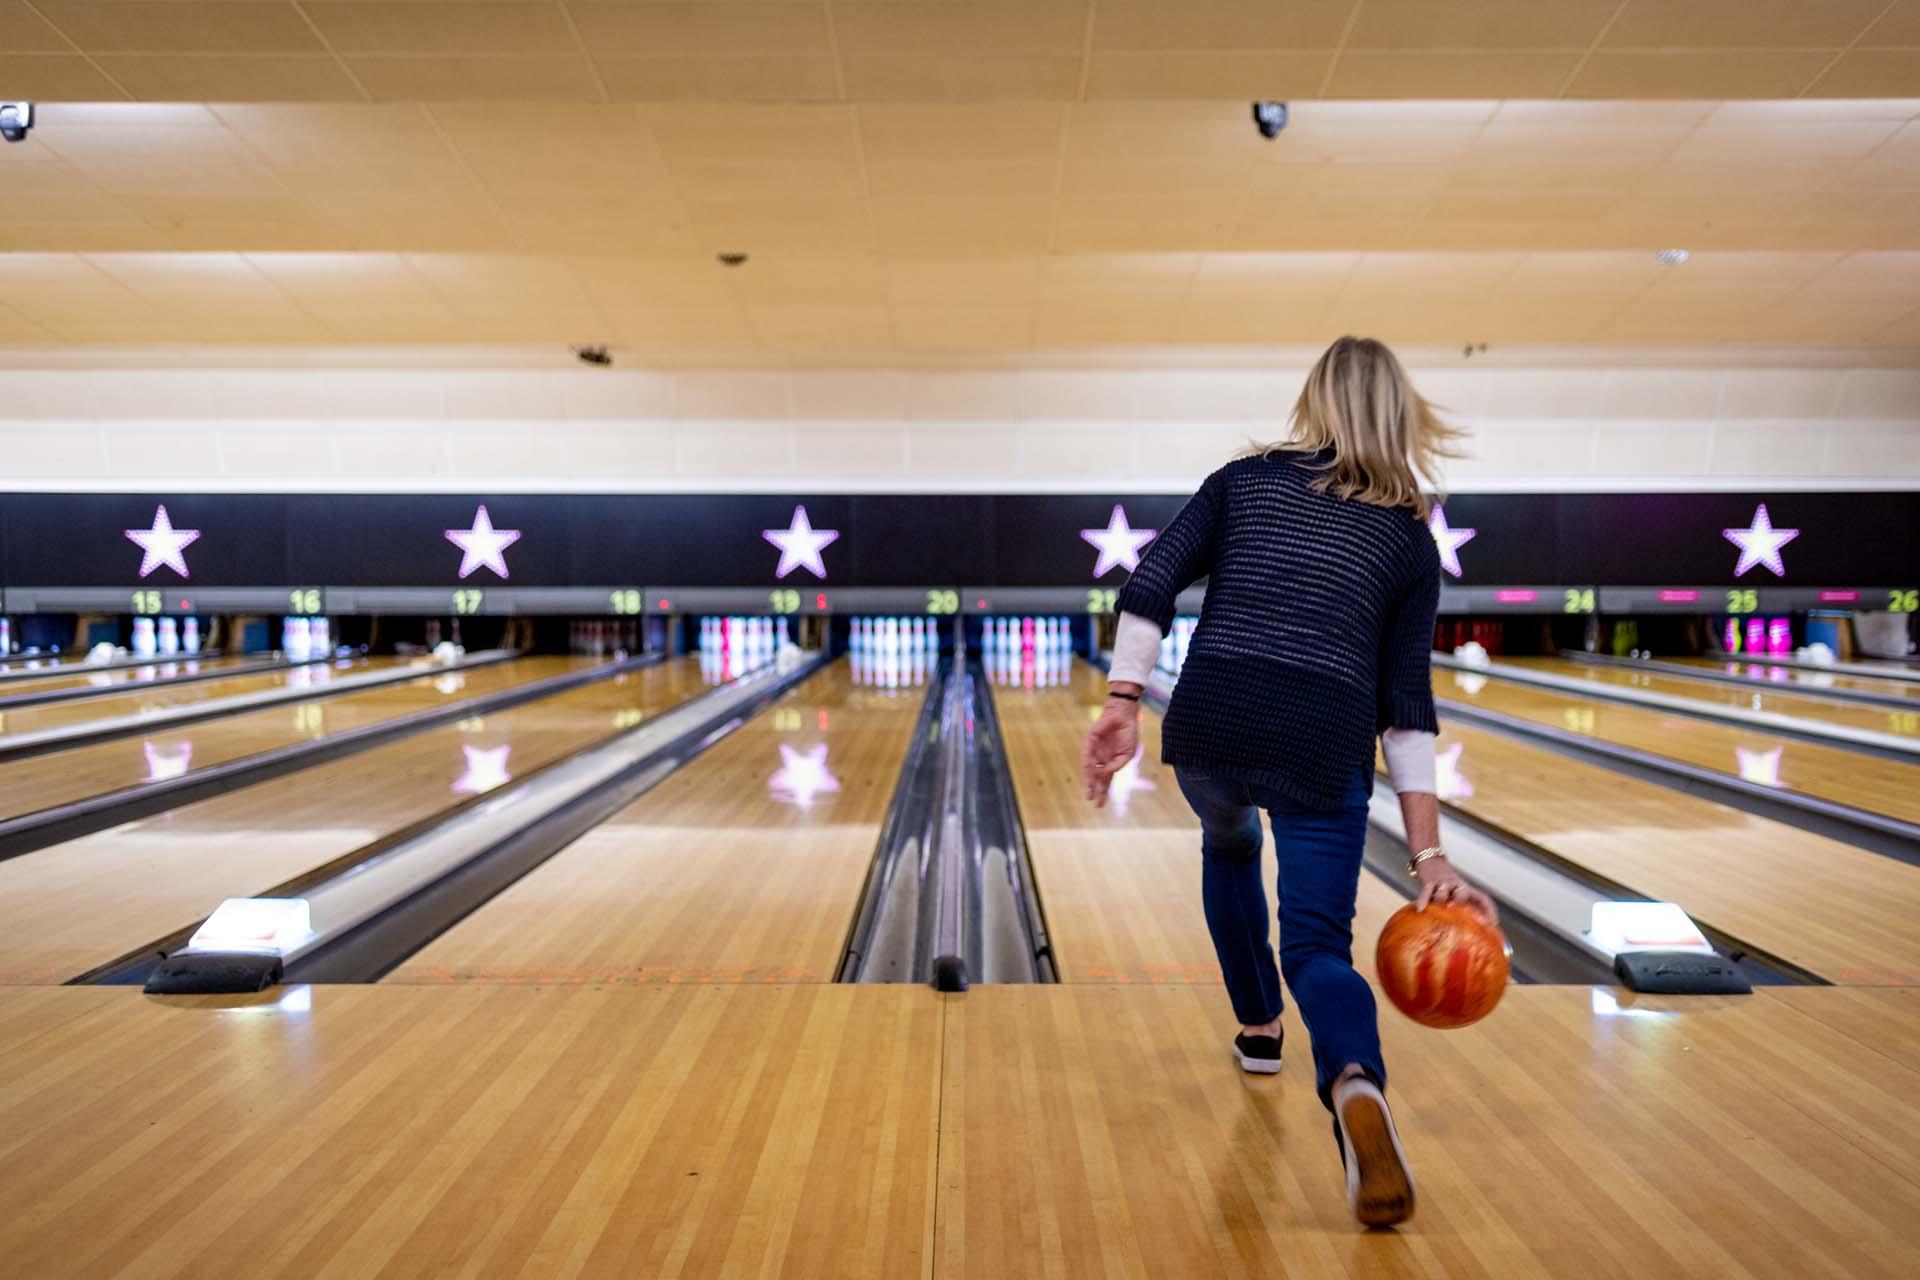 Staff training health and safety bowling crawley hollywood bowl 165202a